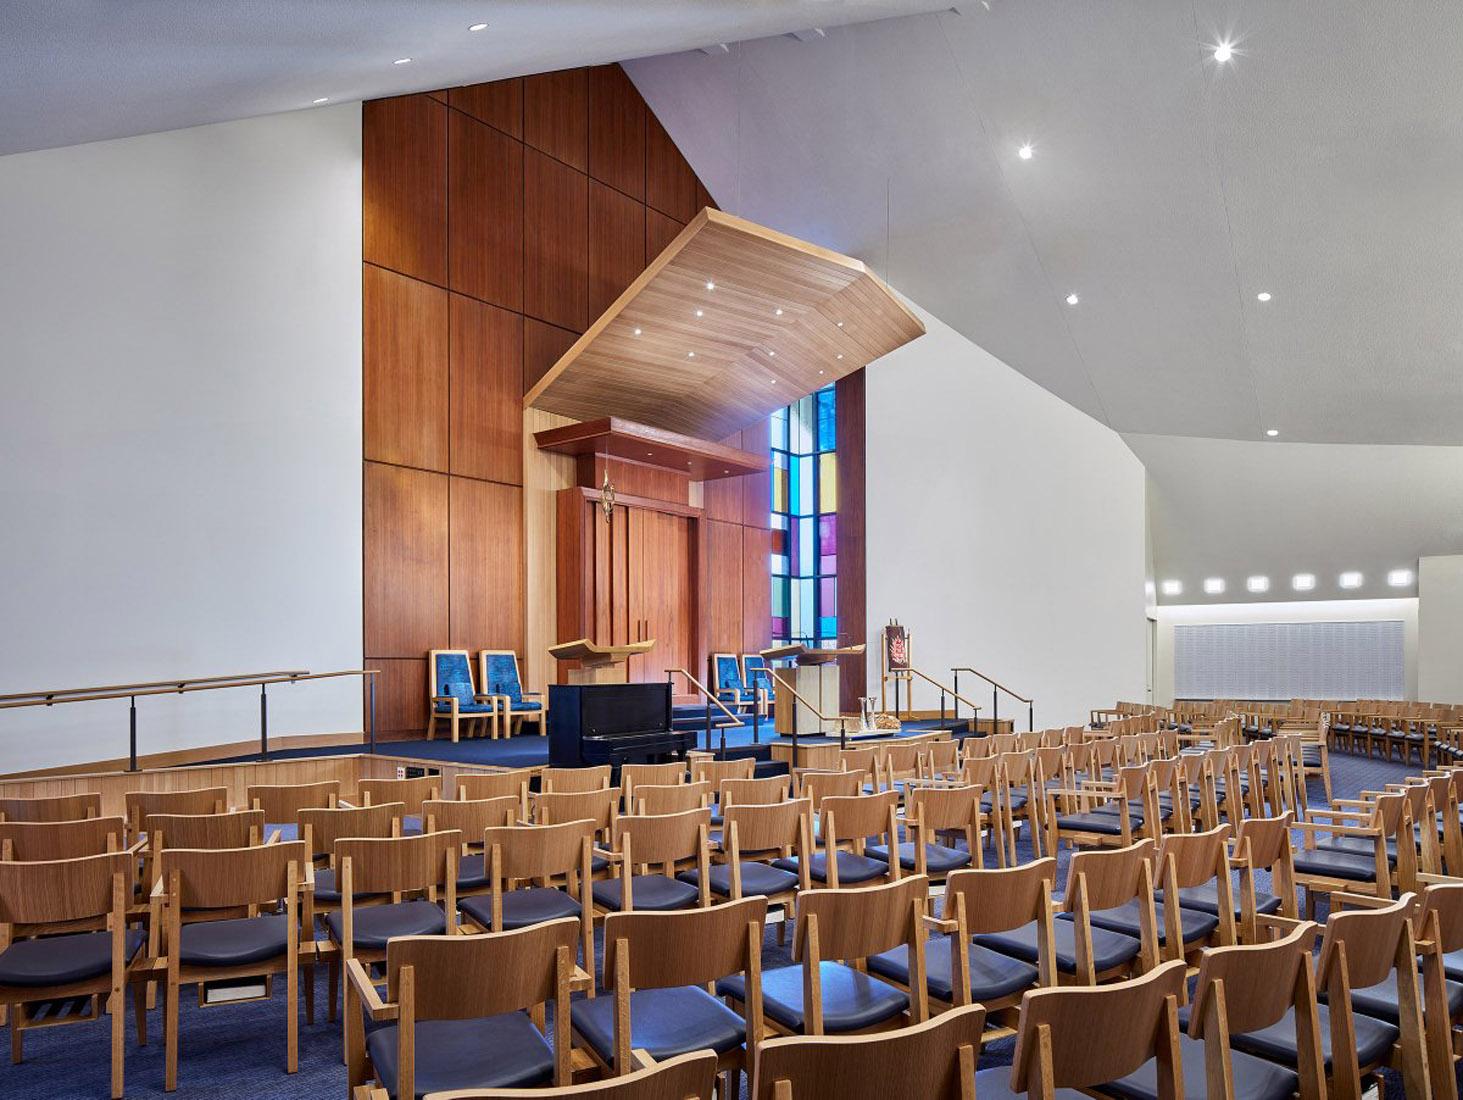 Beth Emet Synagogue